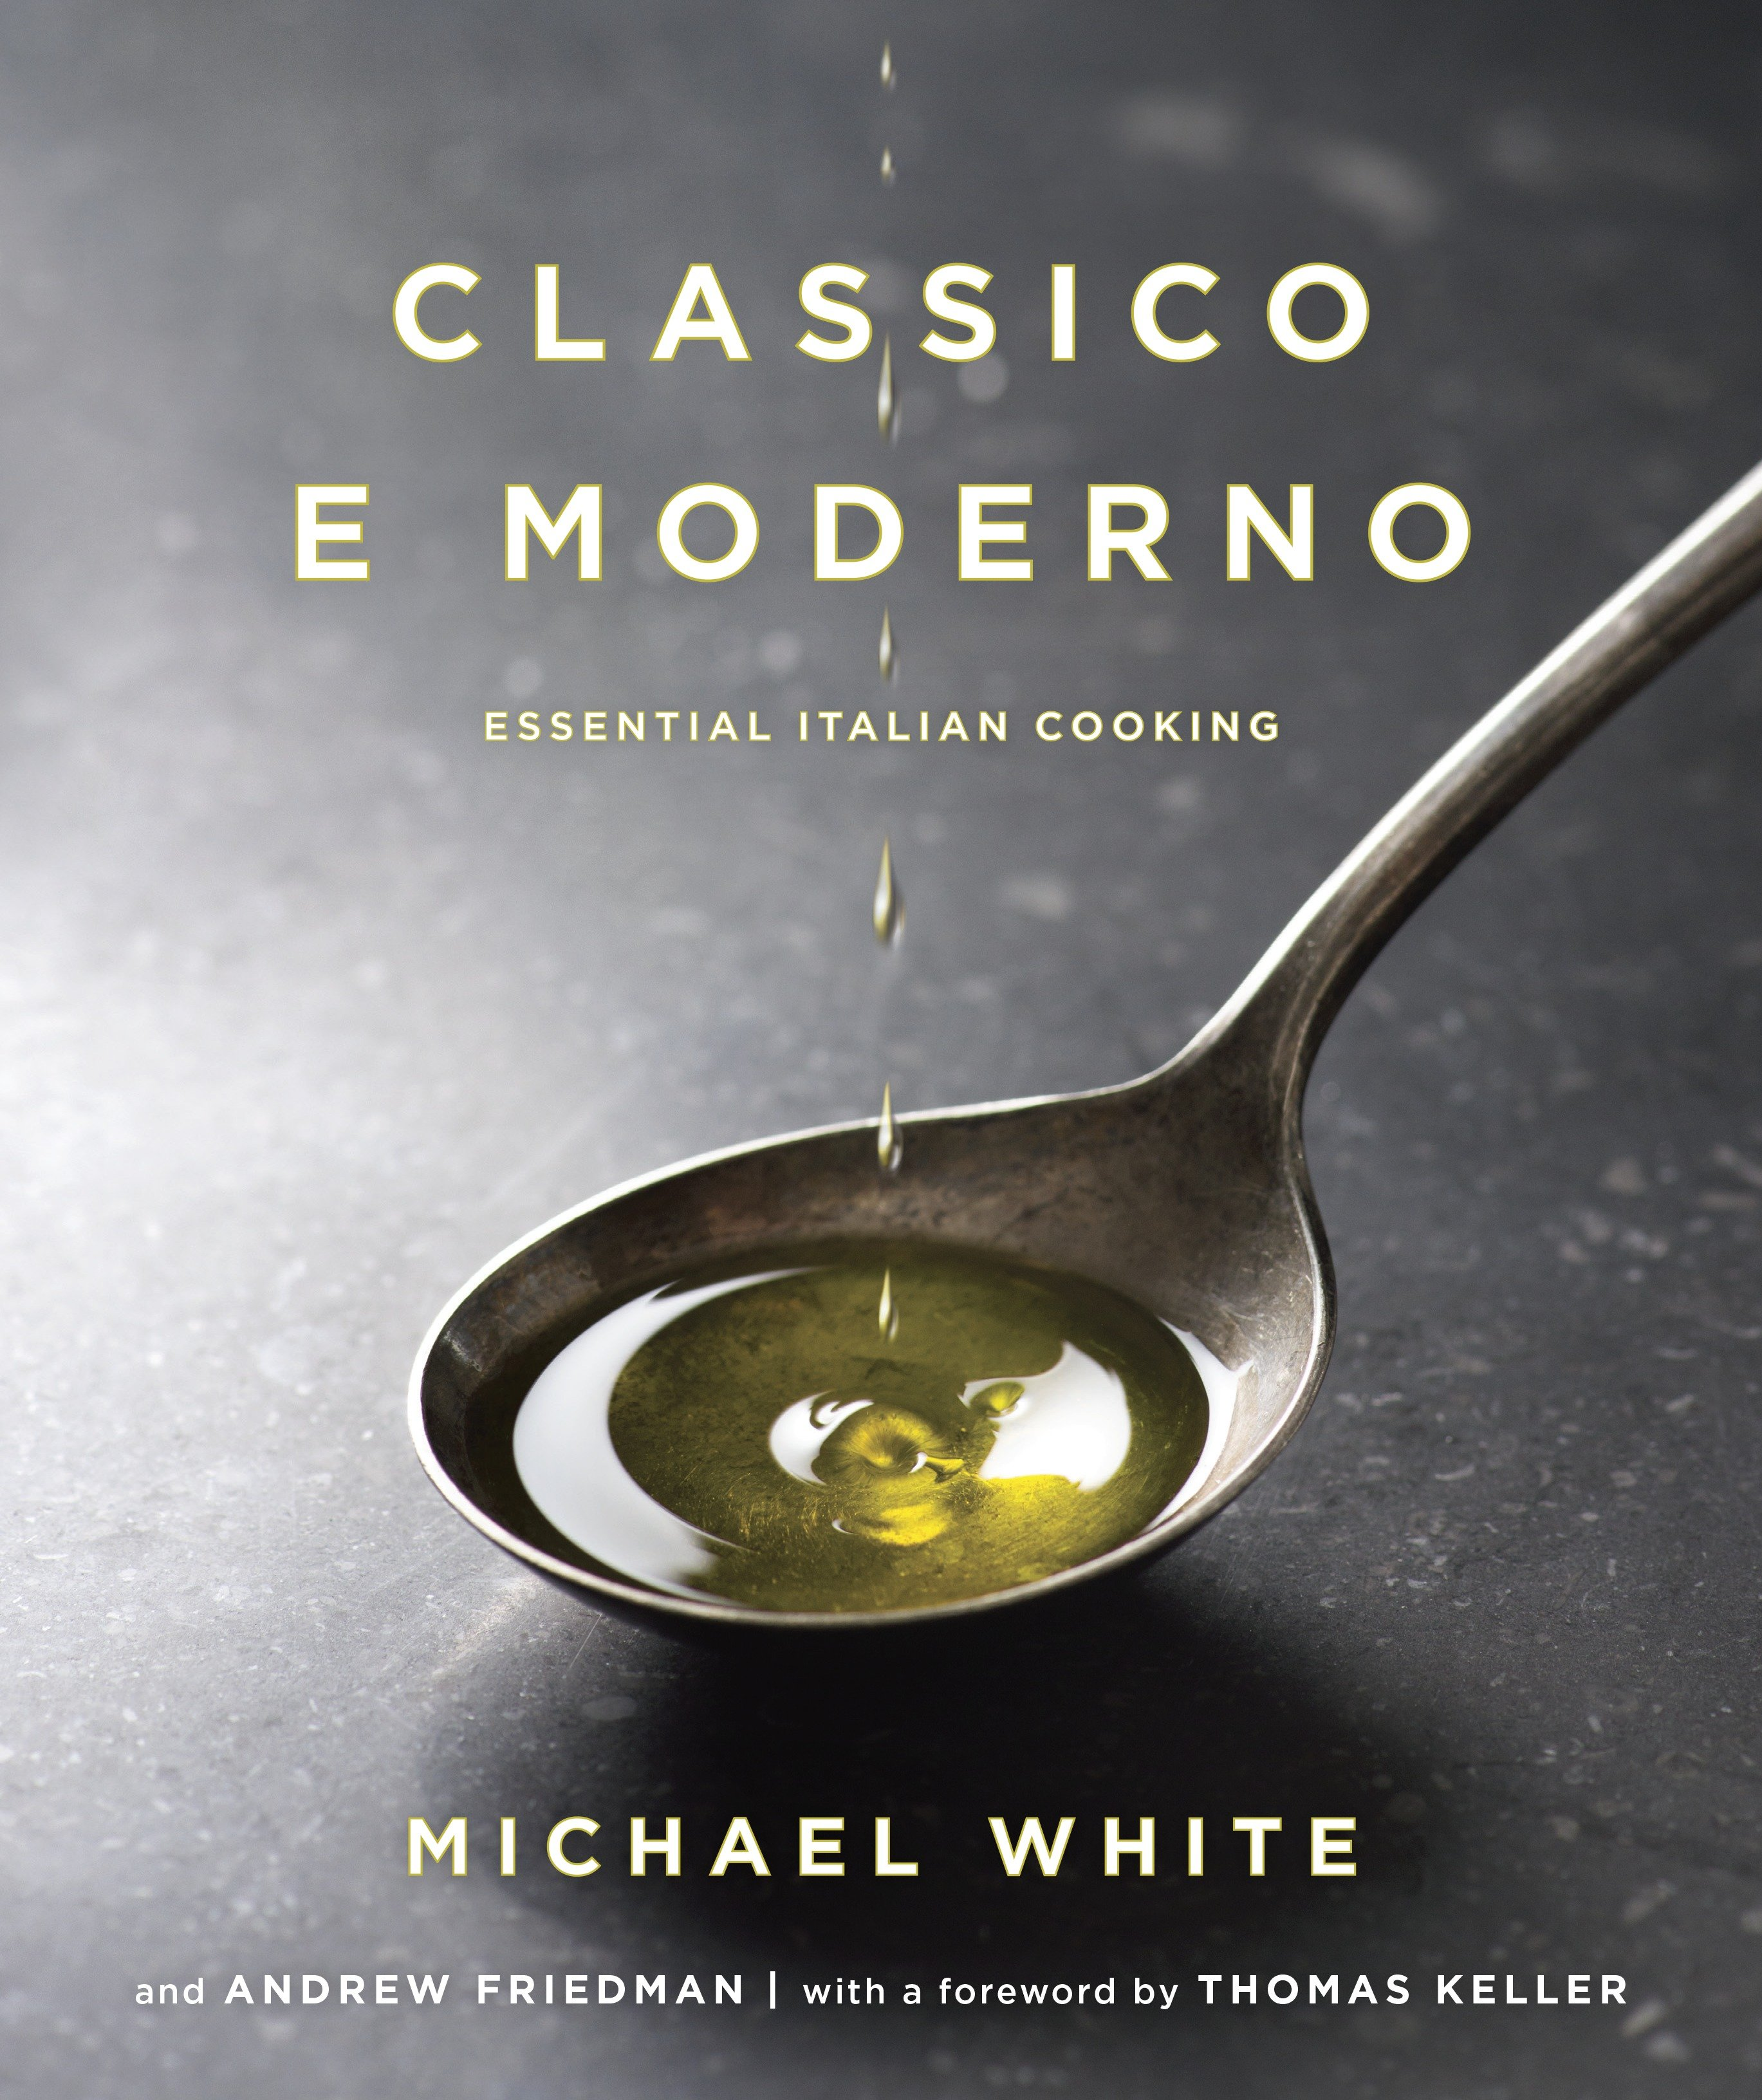 Classico e moderno essential Italian cooking cover image